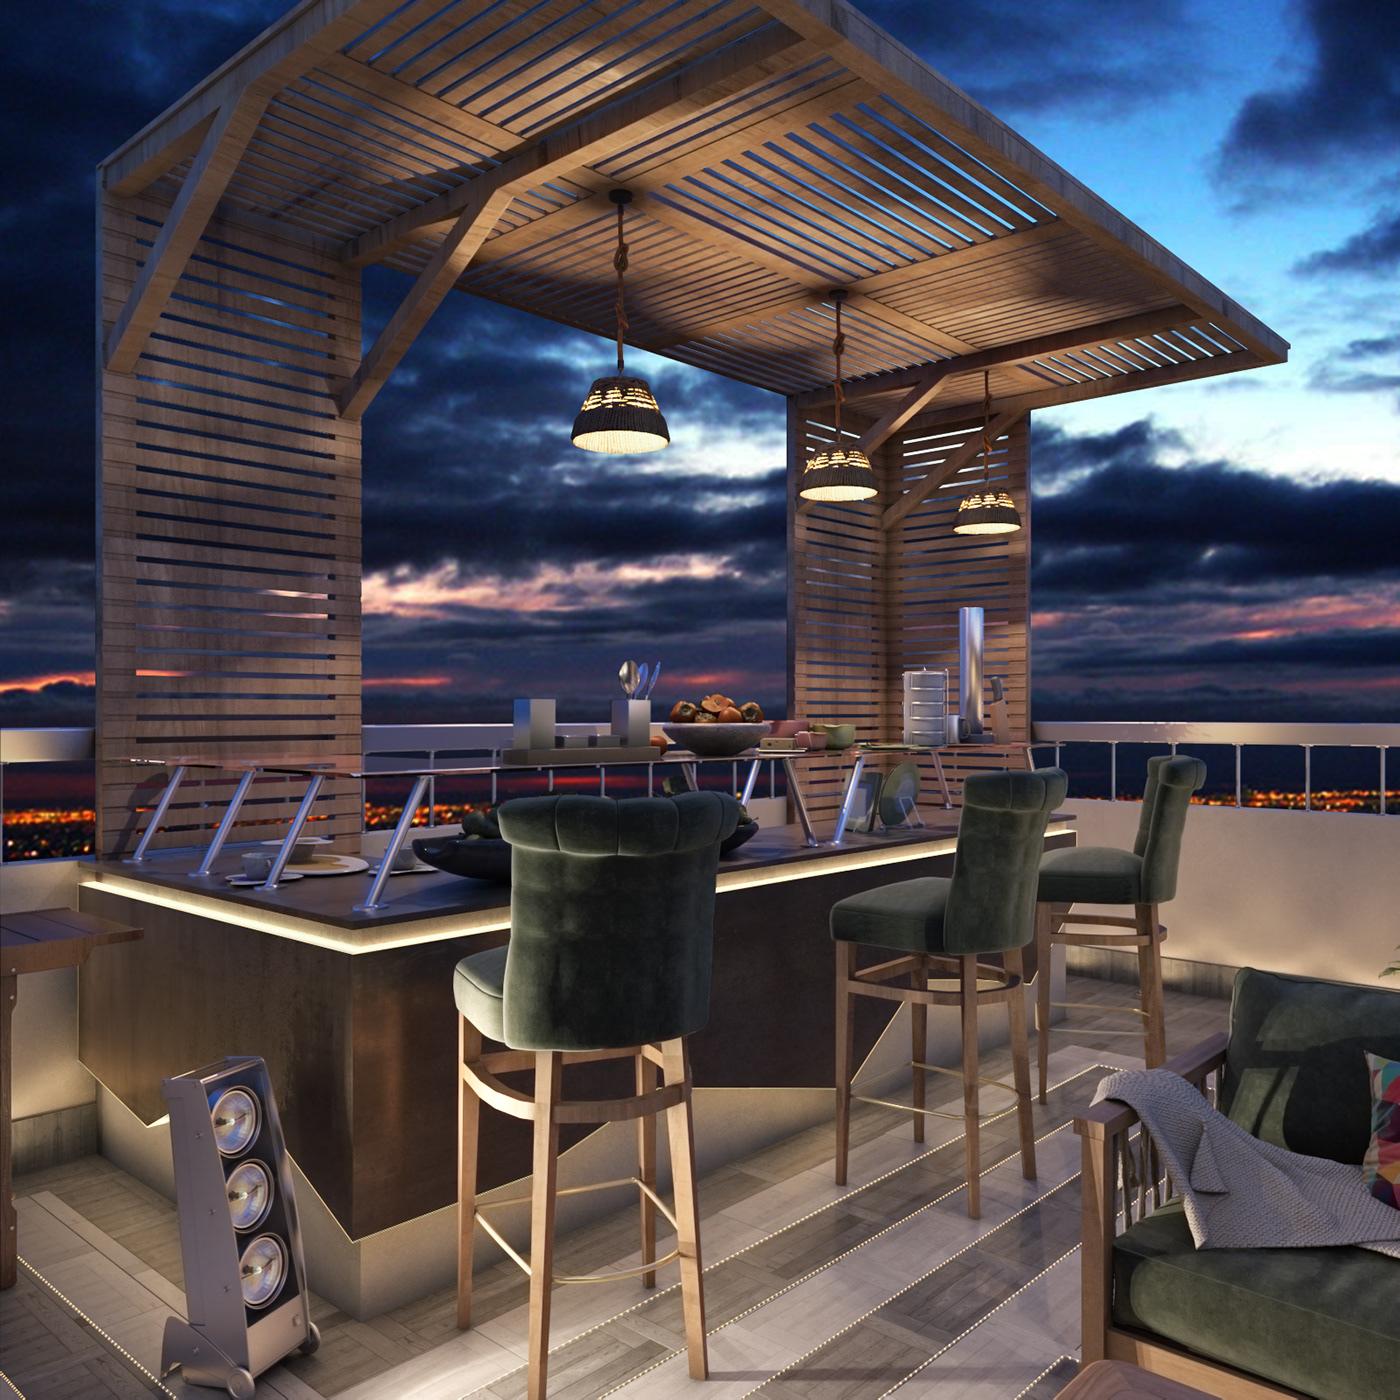 Interior design visualization vray photoshop architecture 3dsmax Motaz mostafa graphics